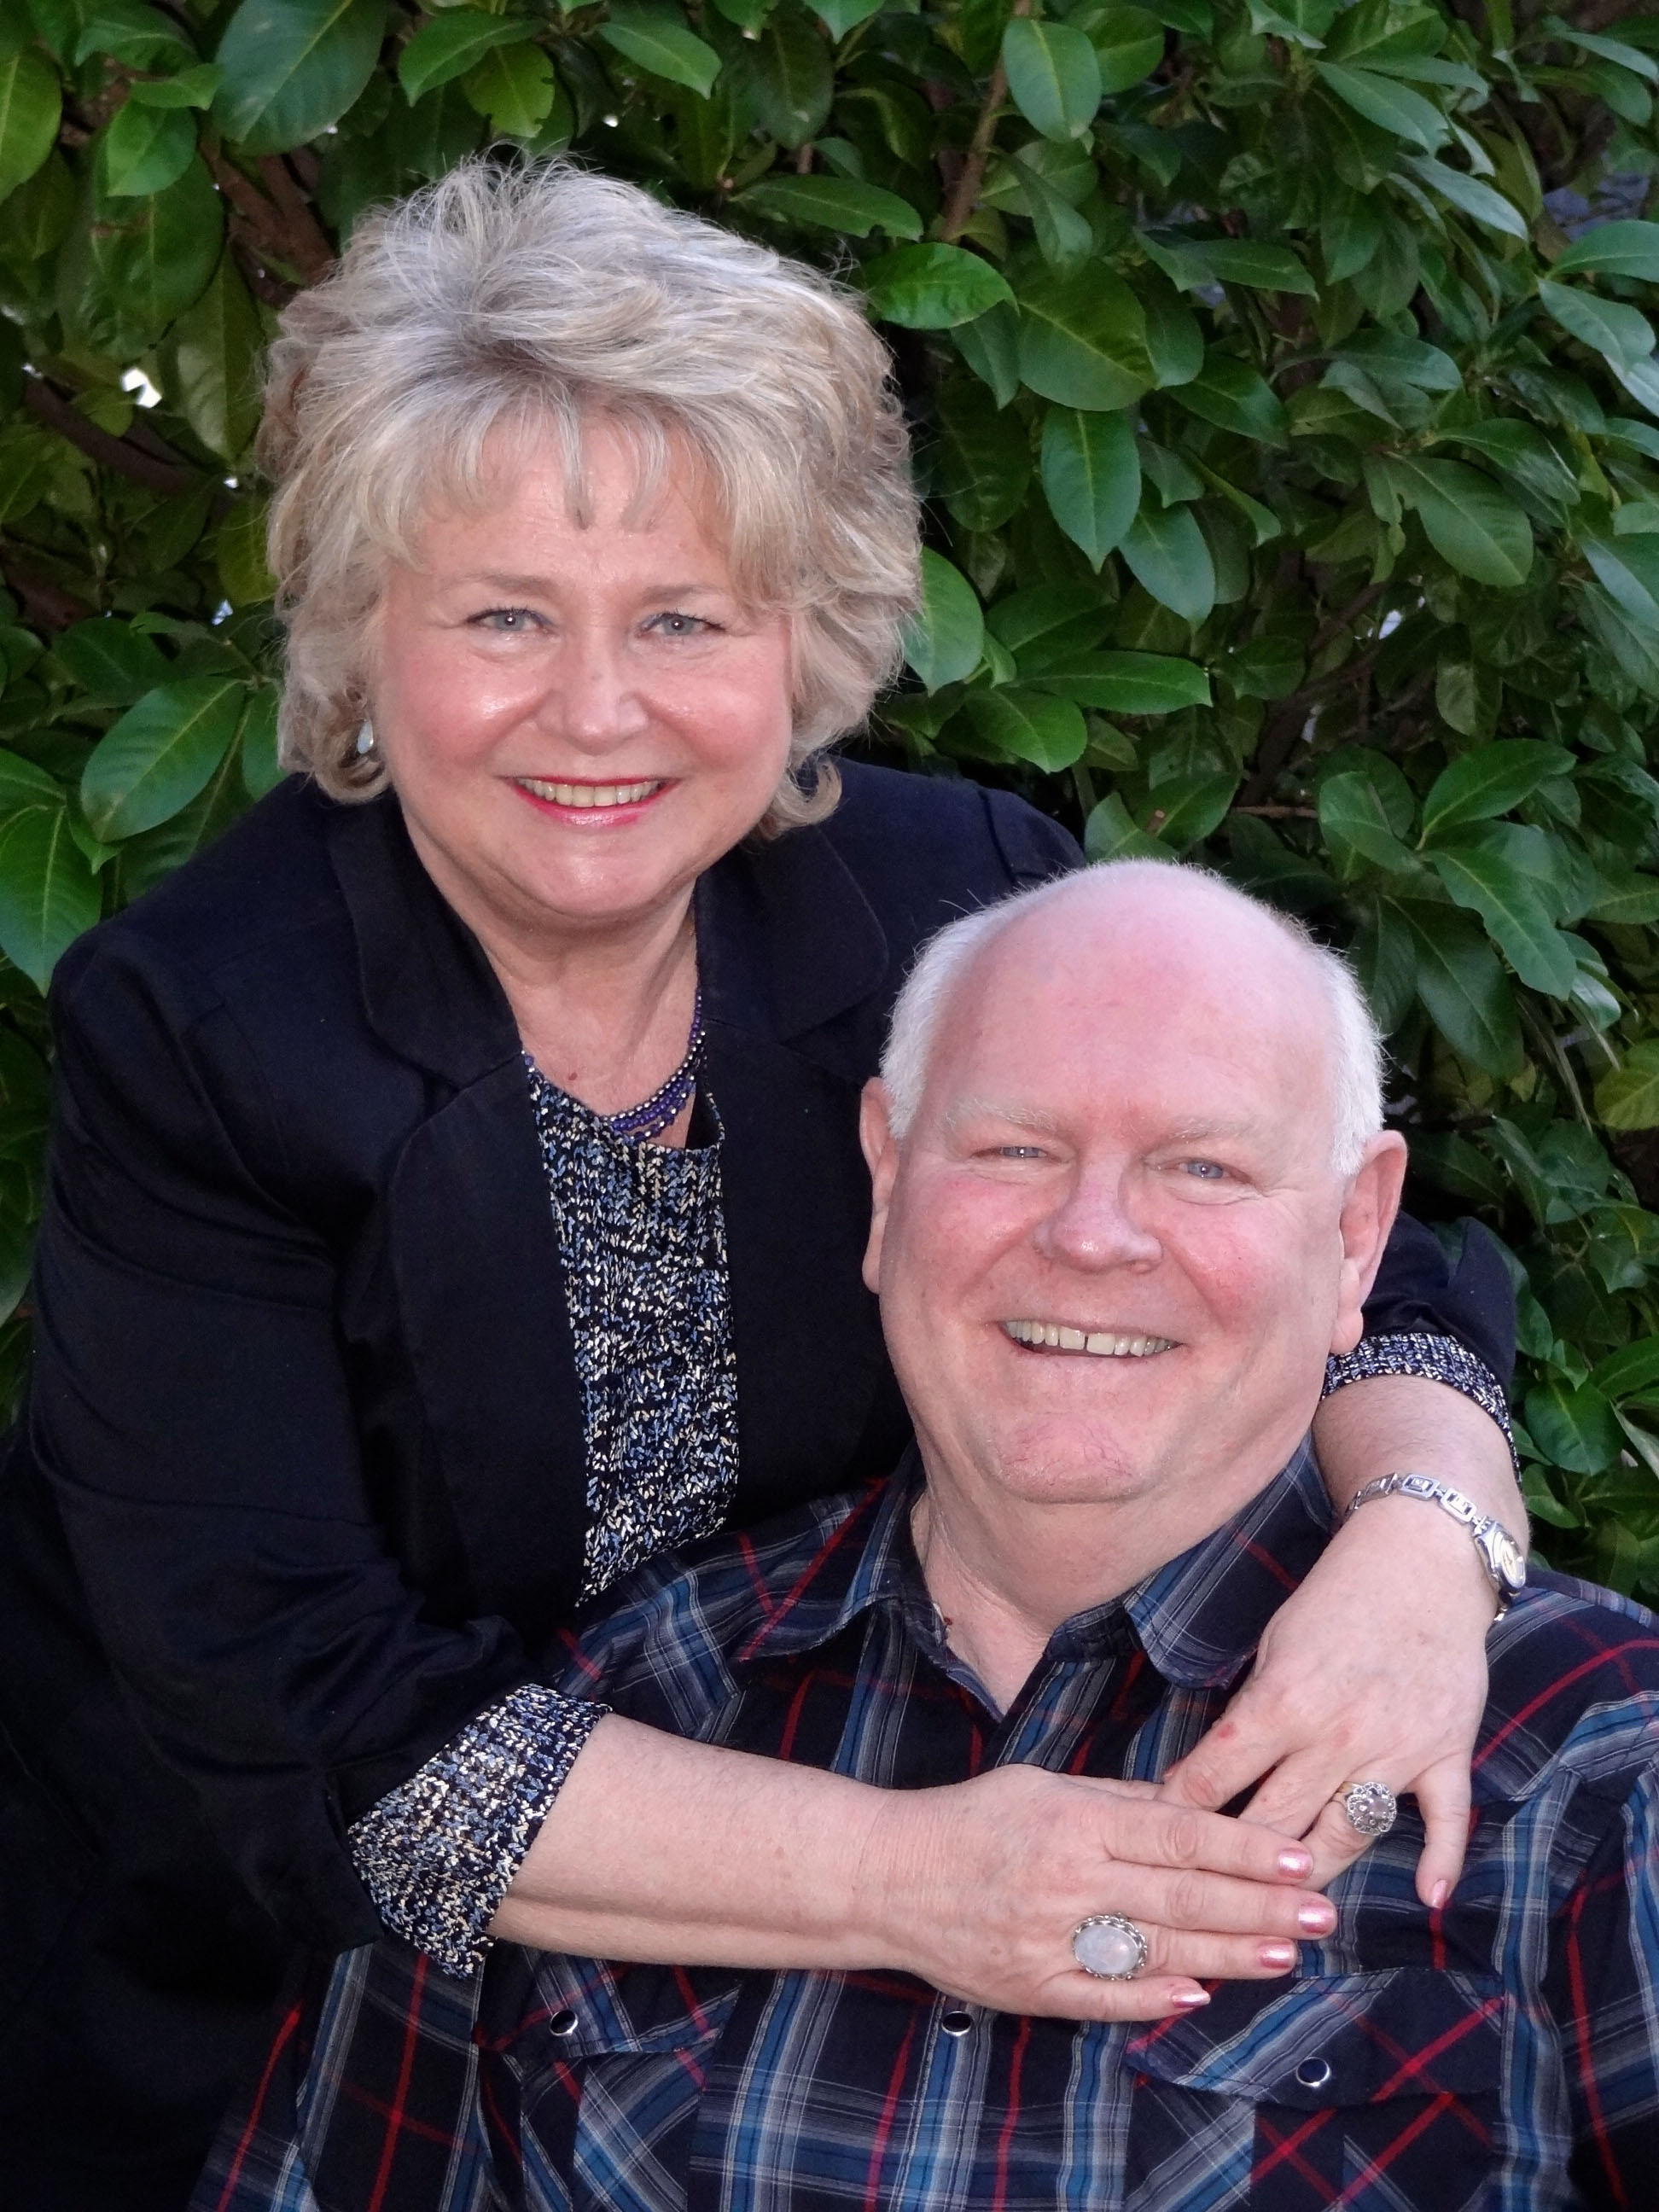 Mike & Kay Chance